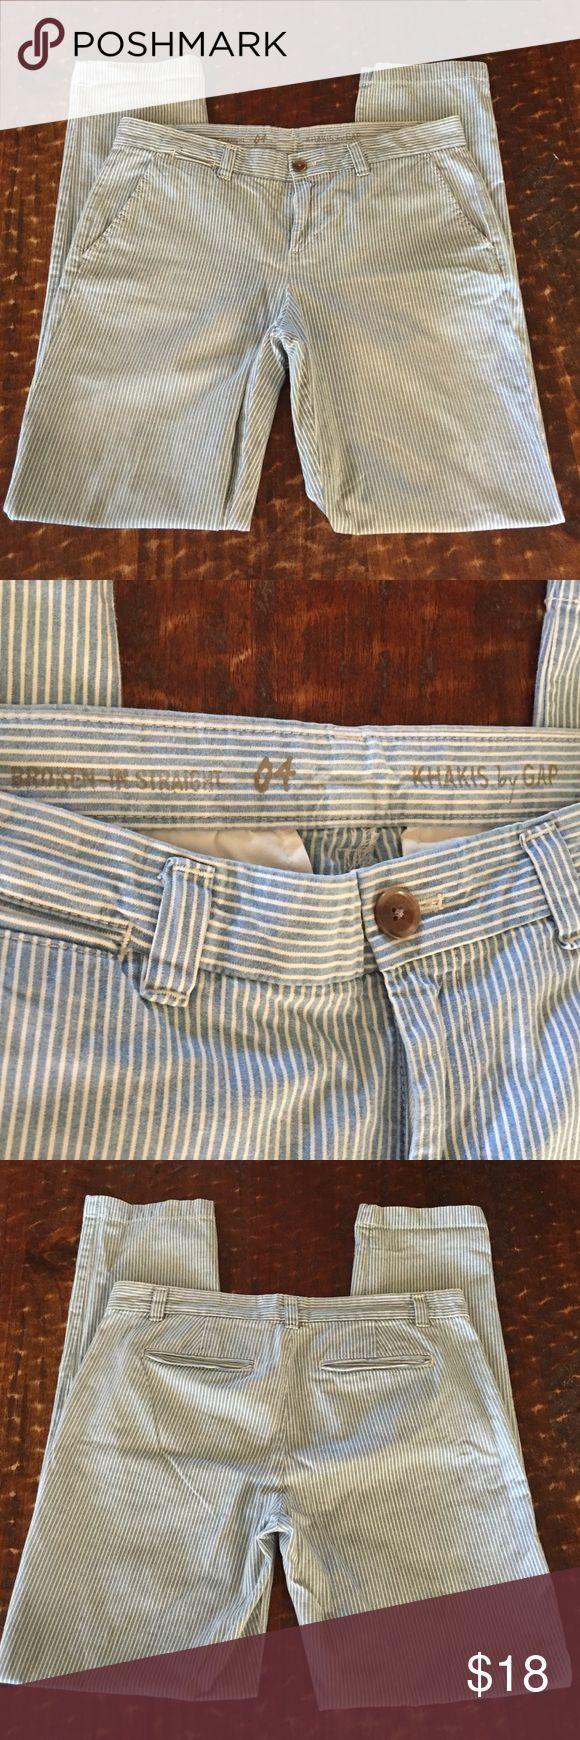 "Gap broken in straight pants, size 4, 31"" inseam Gap broken in straight striped pants, size 4, 31"" inseam, good condition! GAP Pants Straight Leg"